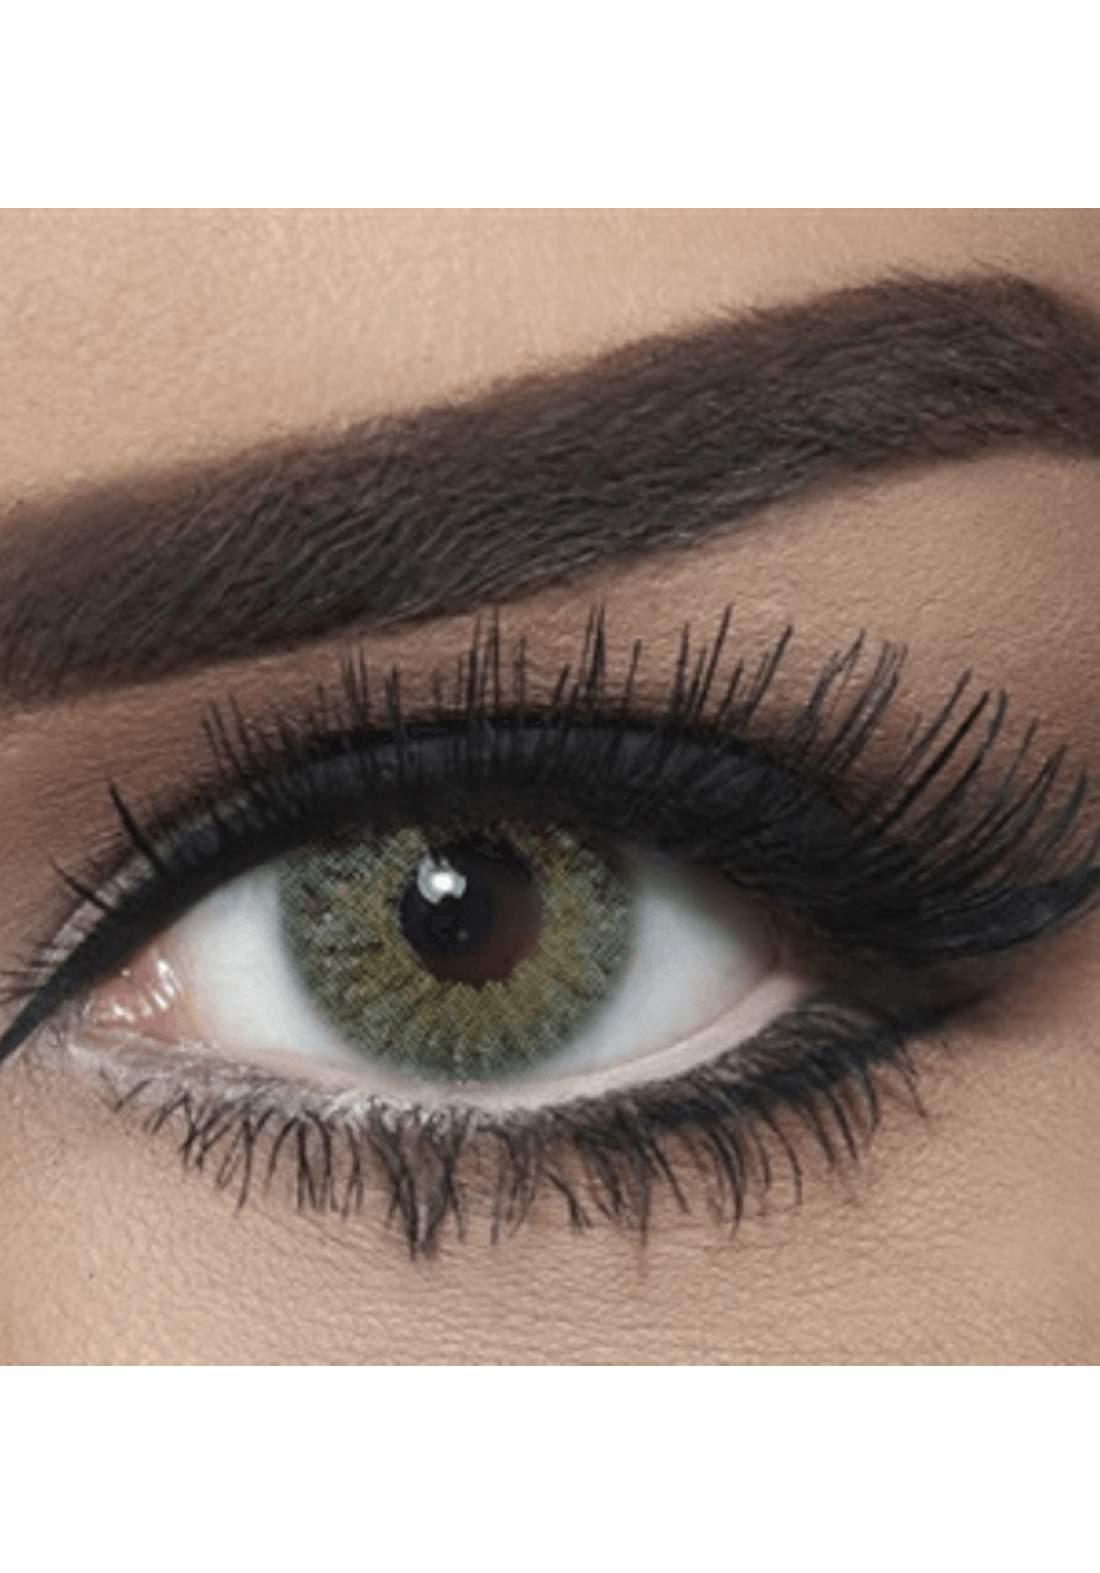 Bella Classic 301021 Contact Lenses 3 Months Use Natural - Green No.22 عدسات لاصقة